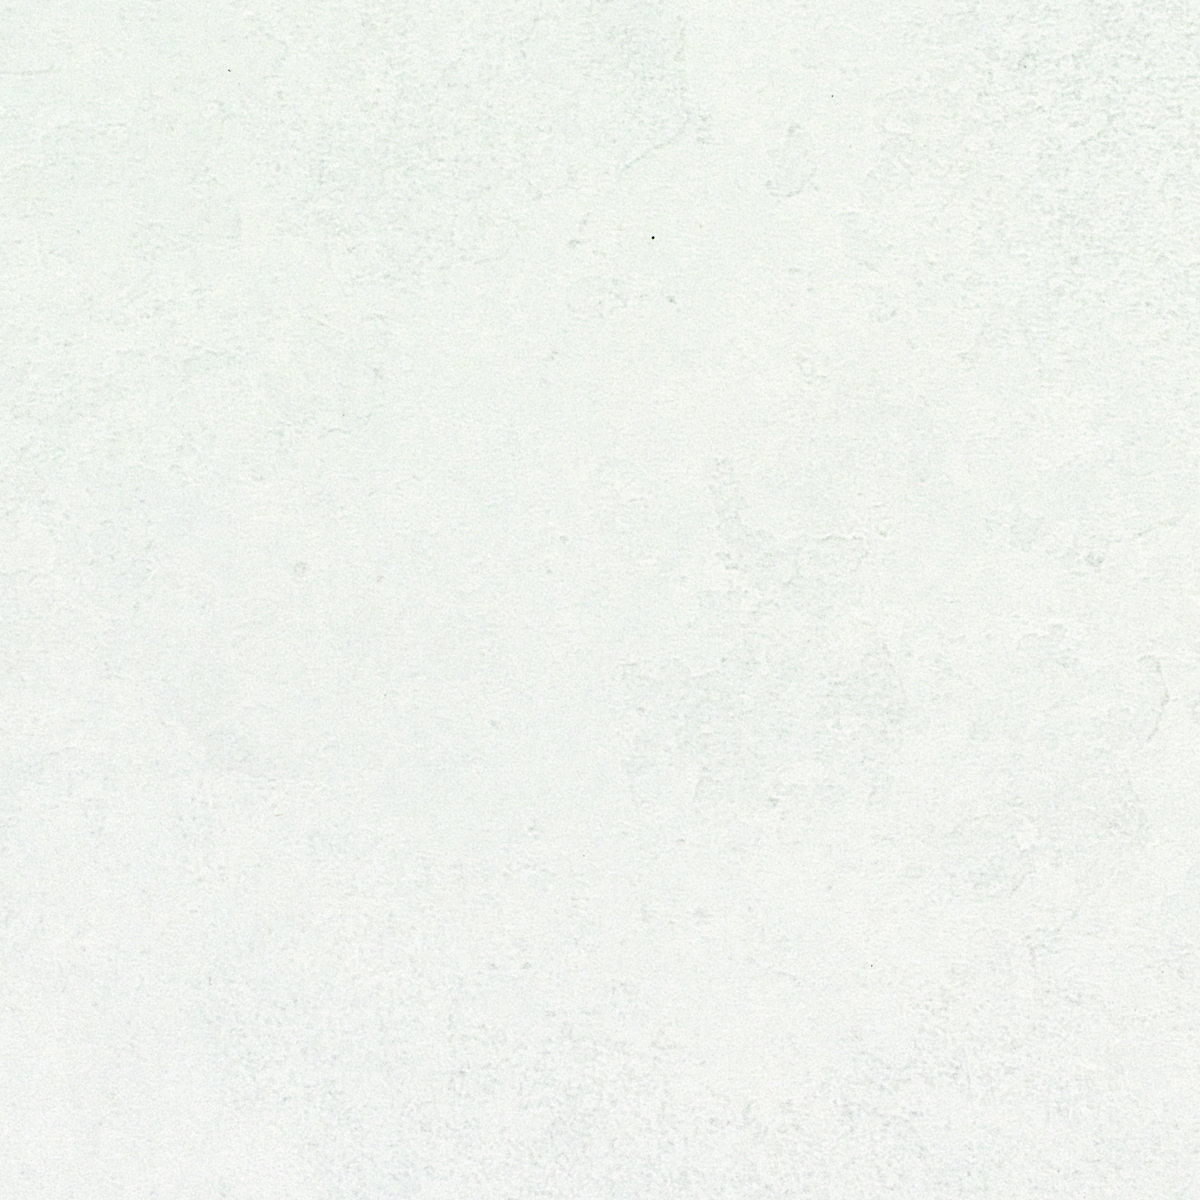 Quartz Laminate Worktops : White Quartz Fireglaze Worktop 3600mm